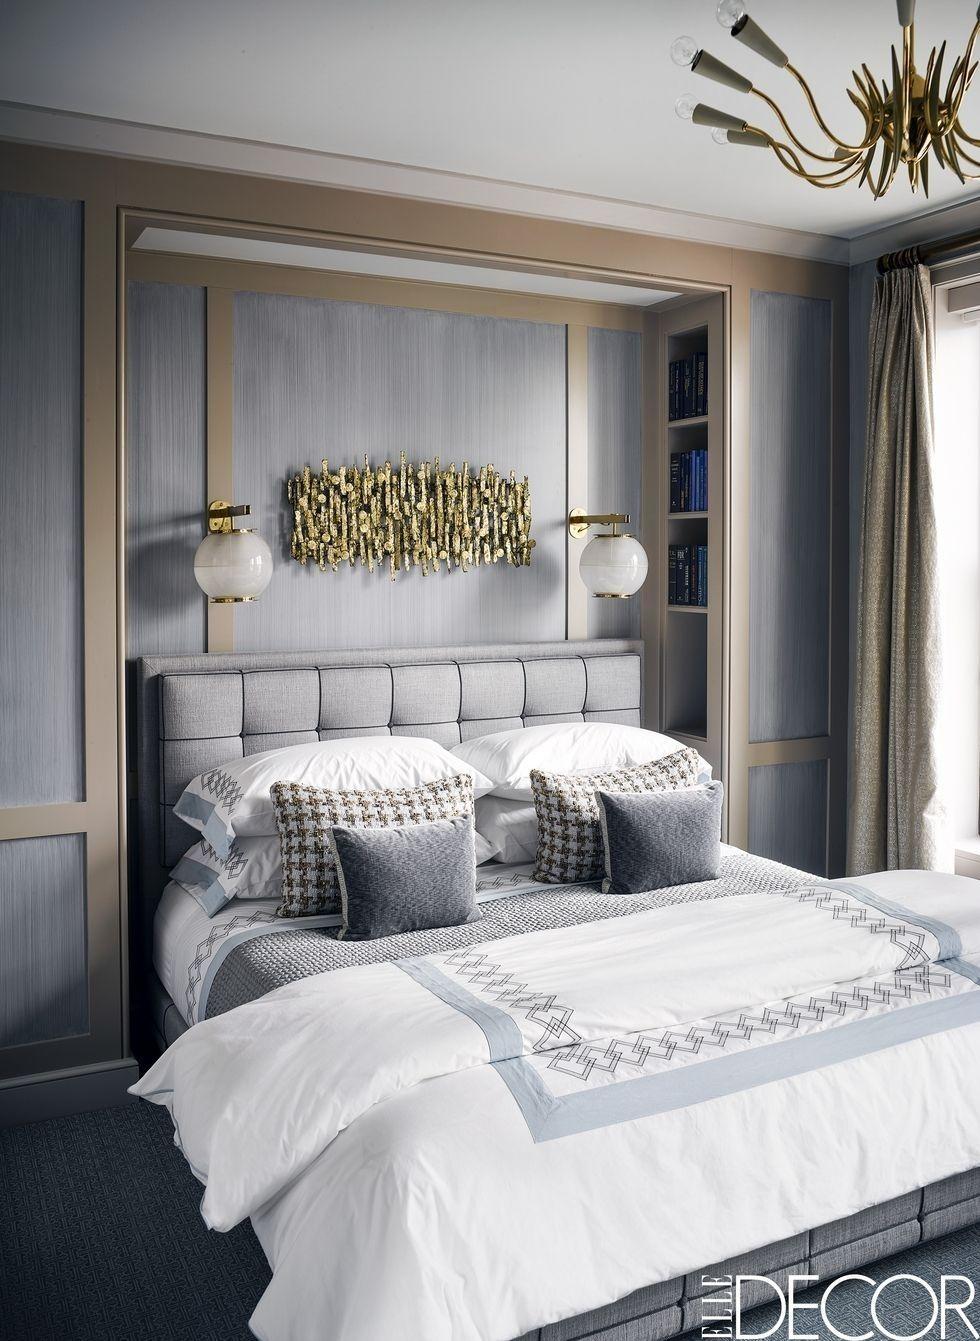 40 bedroom lighting ideas unique lights for bedrooms rh elledecor com & Cool Bedroom Lighting Design Inspiration - The Most New House ...